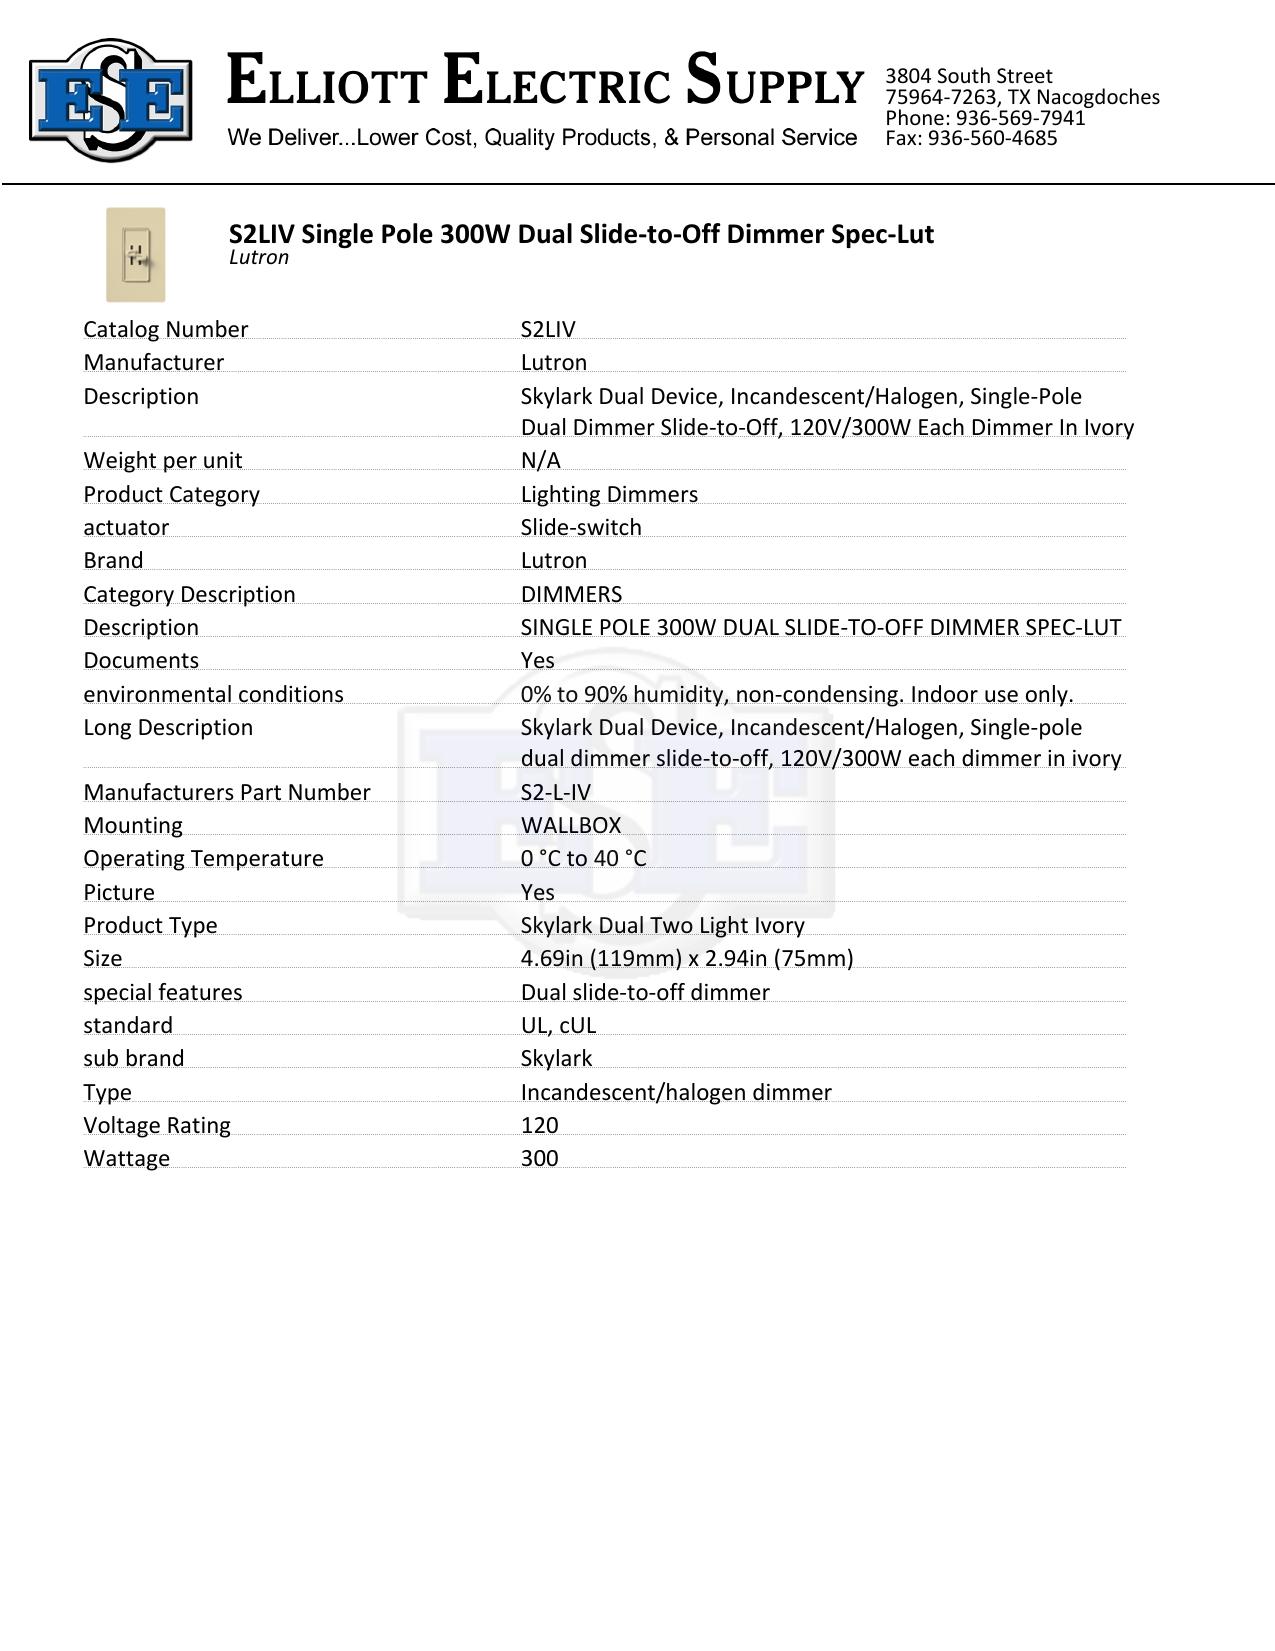 S2liv Single Pole 300w Dual Slide To Off Dimmer Spec Lut Manualzz Com